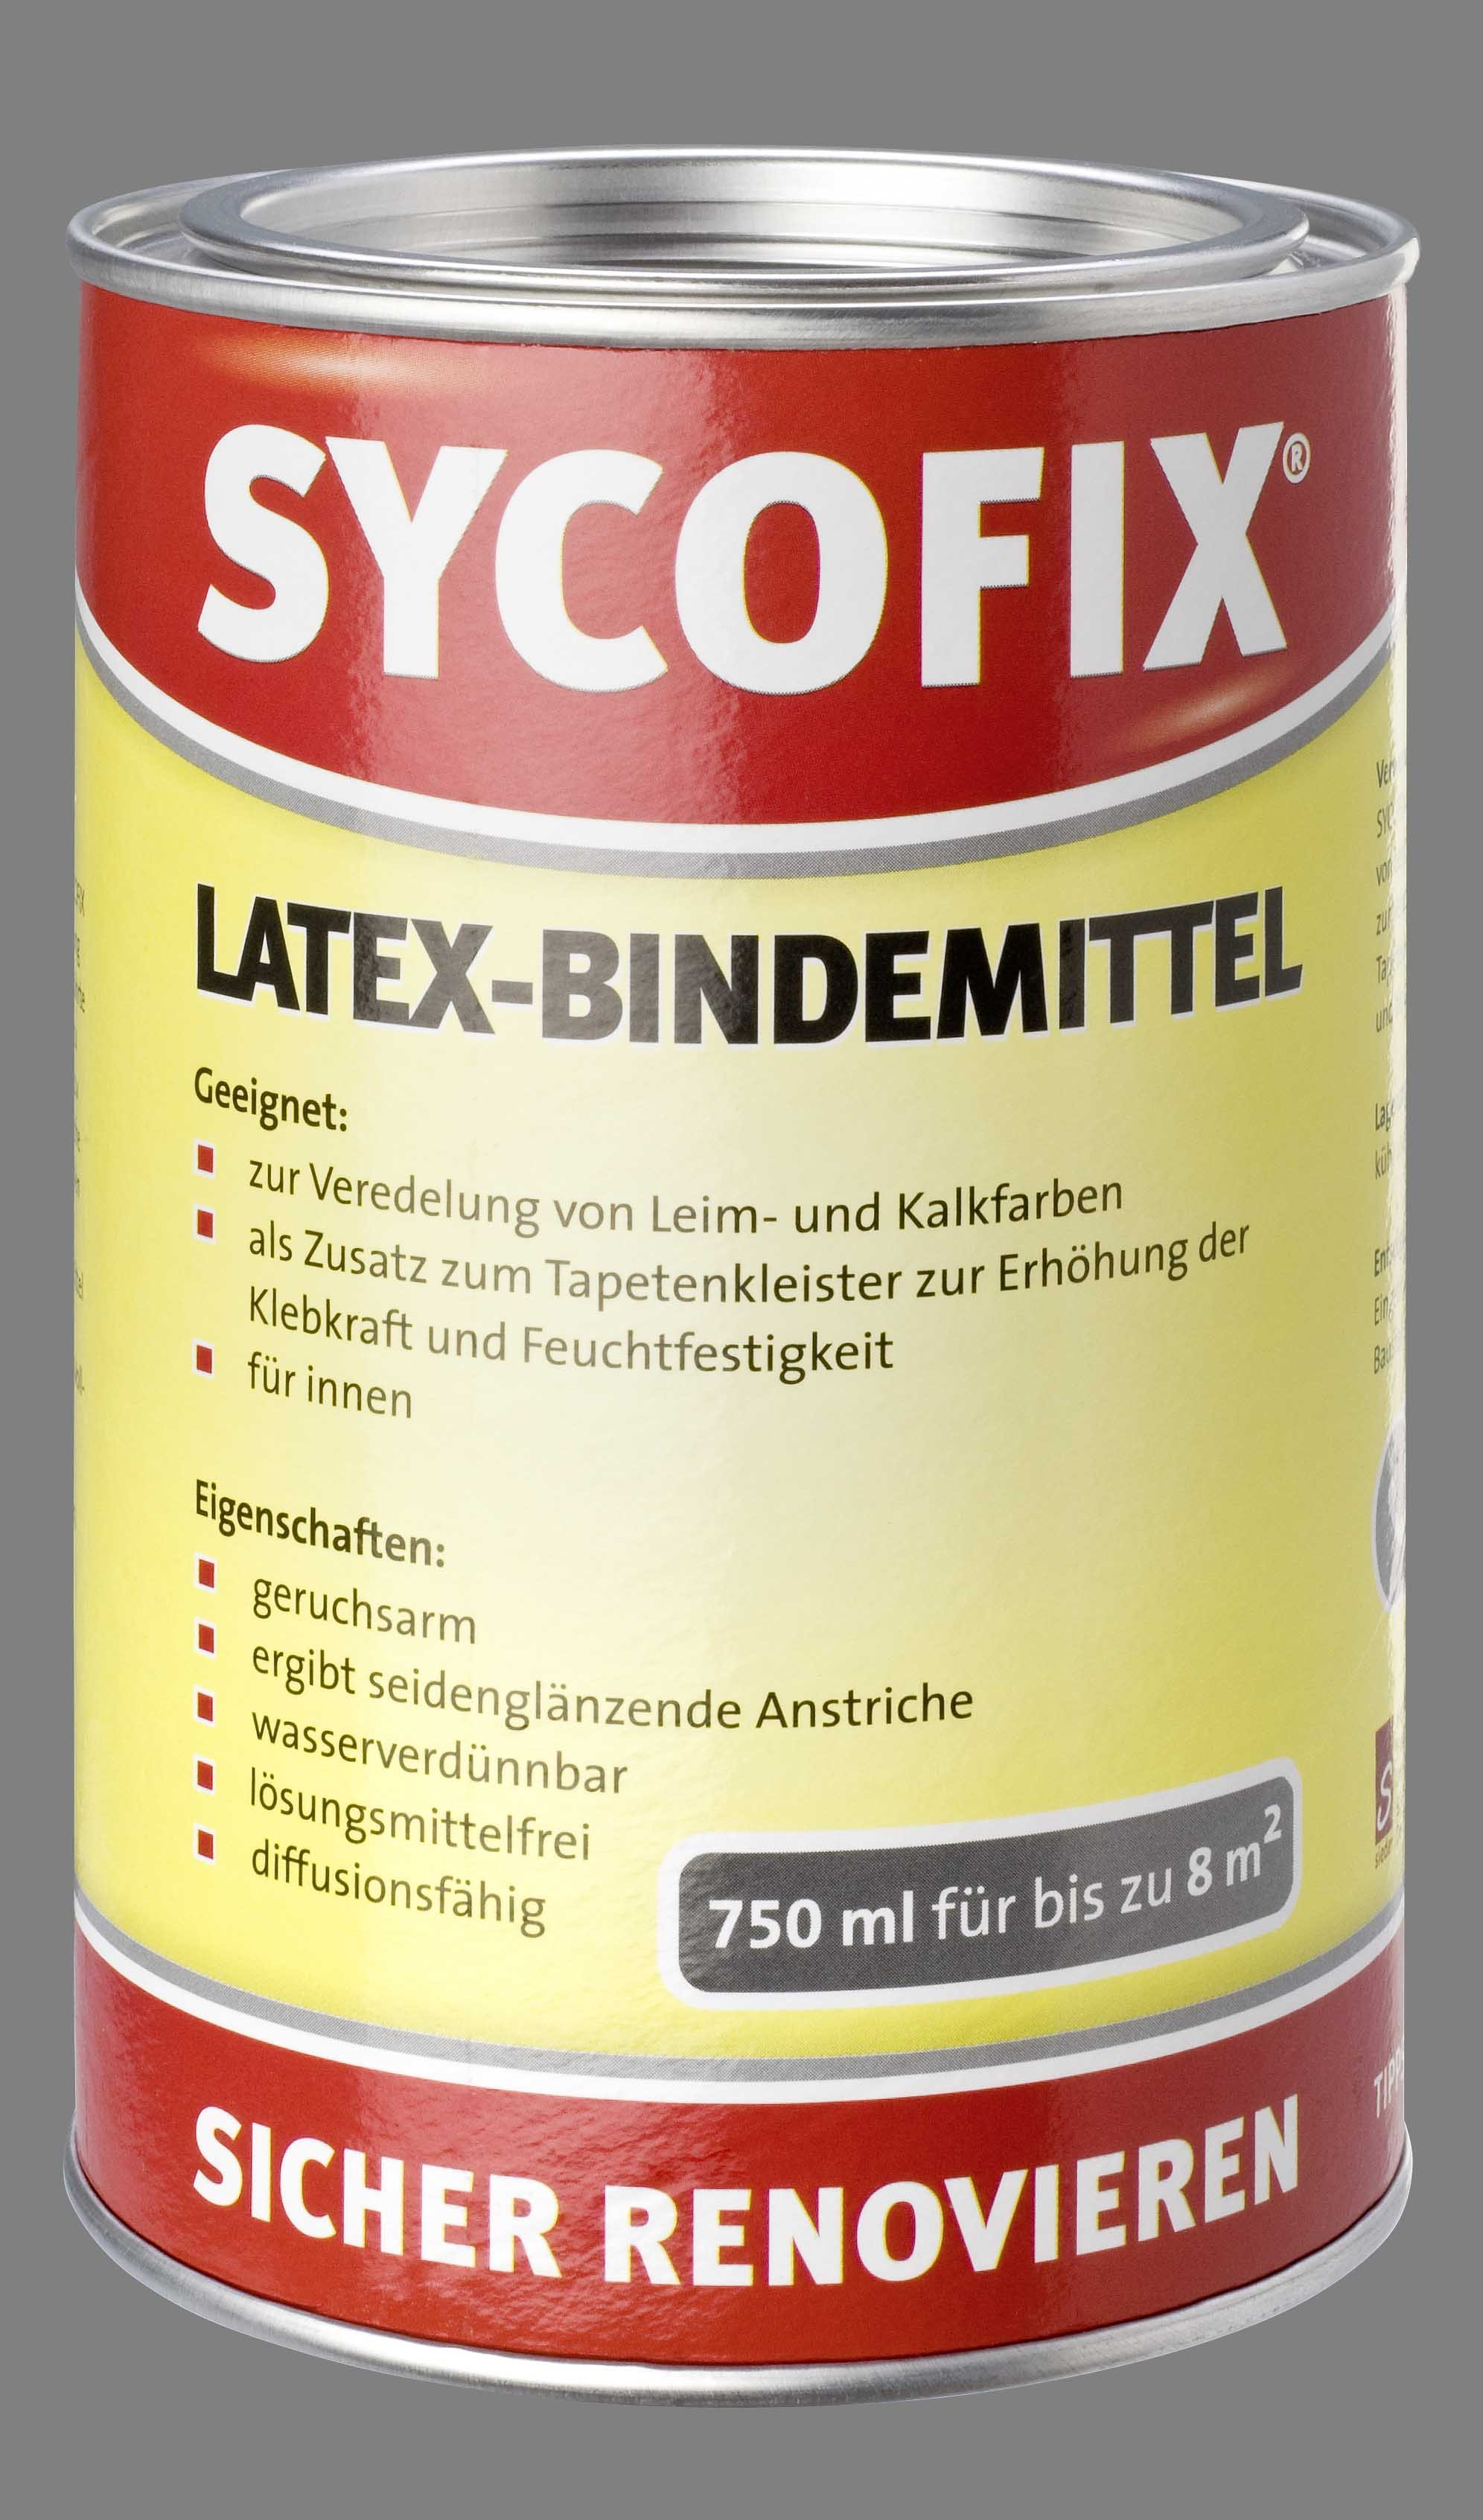 Sycofix - Latex Bindemittel 750ml